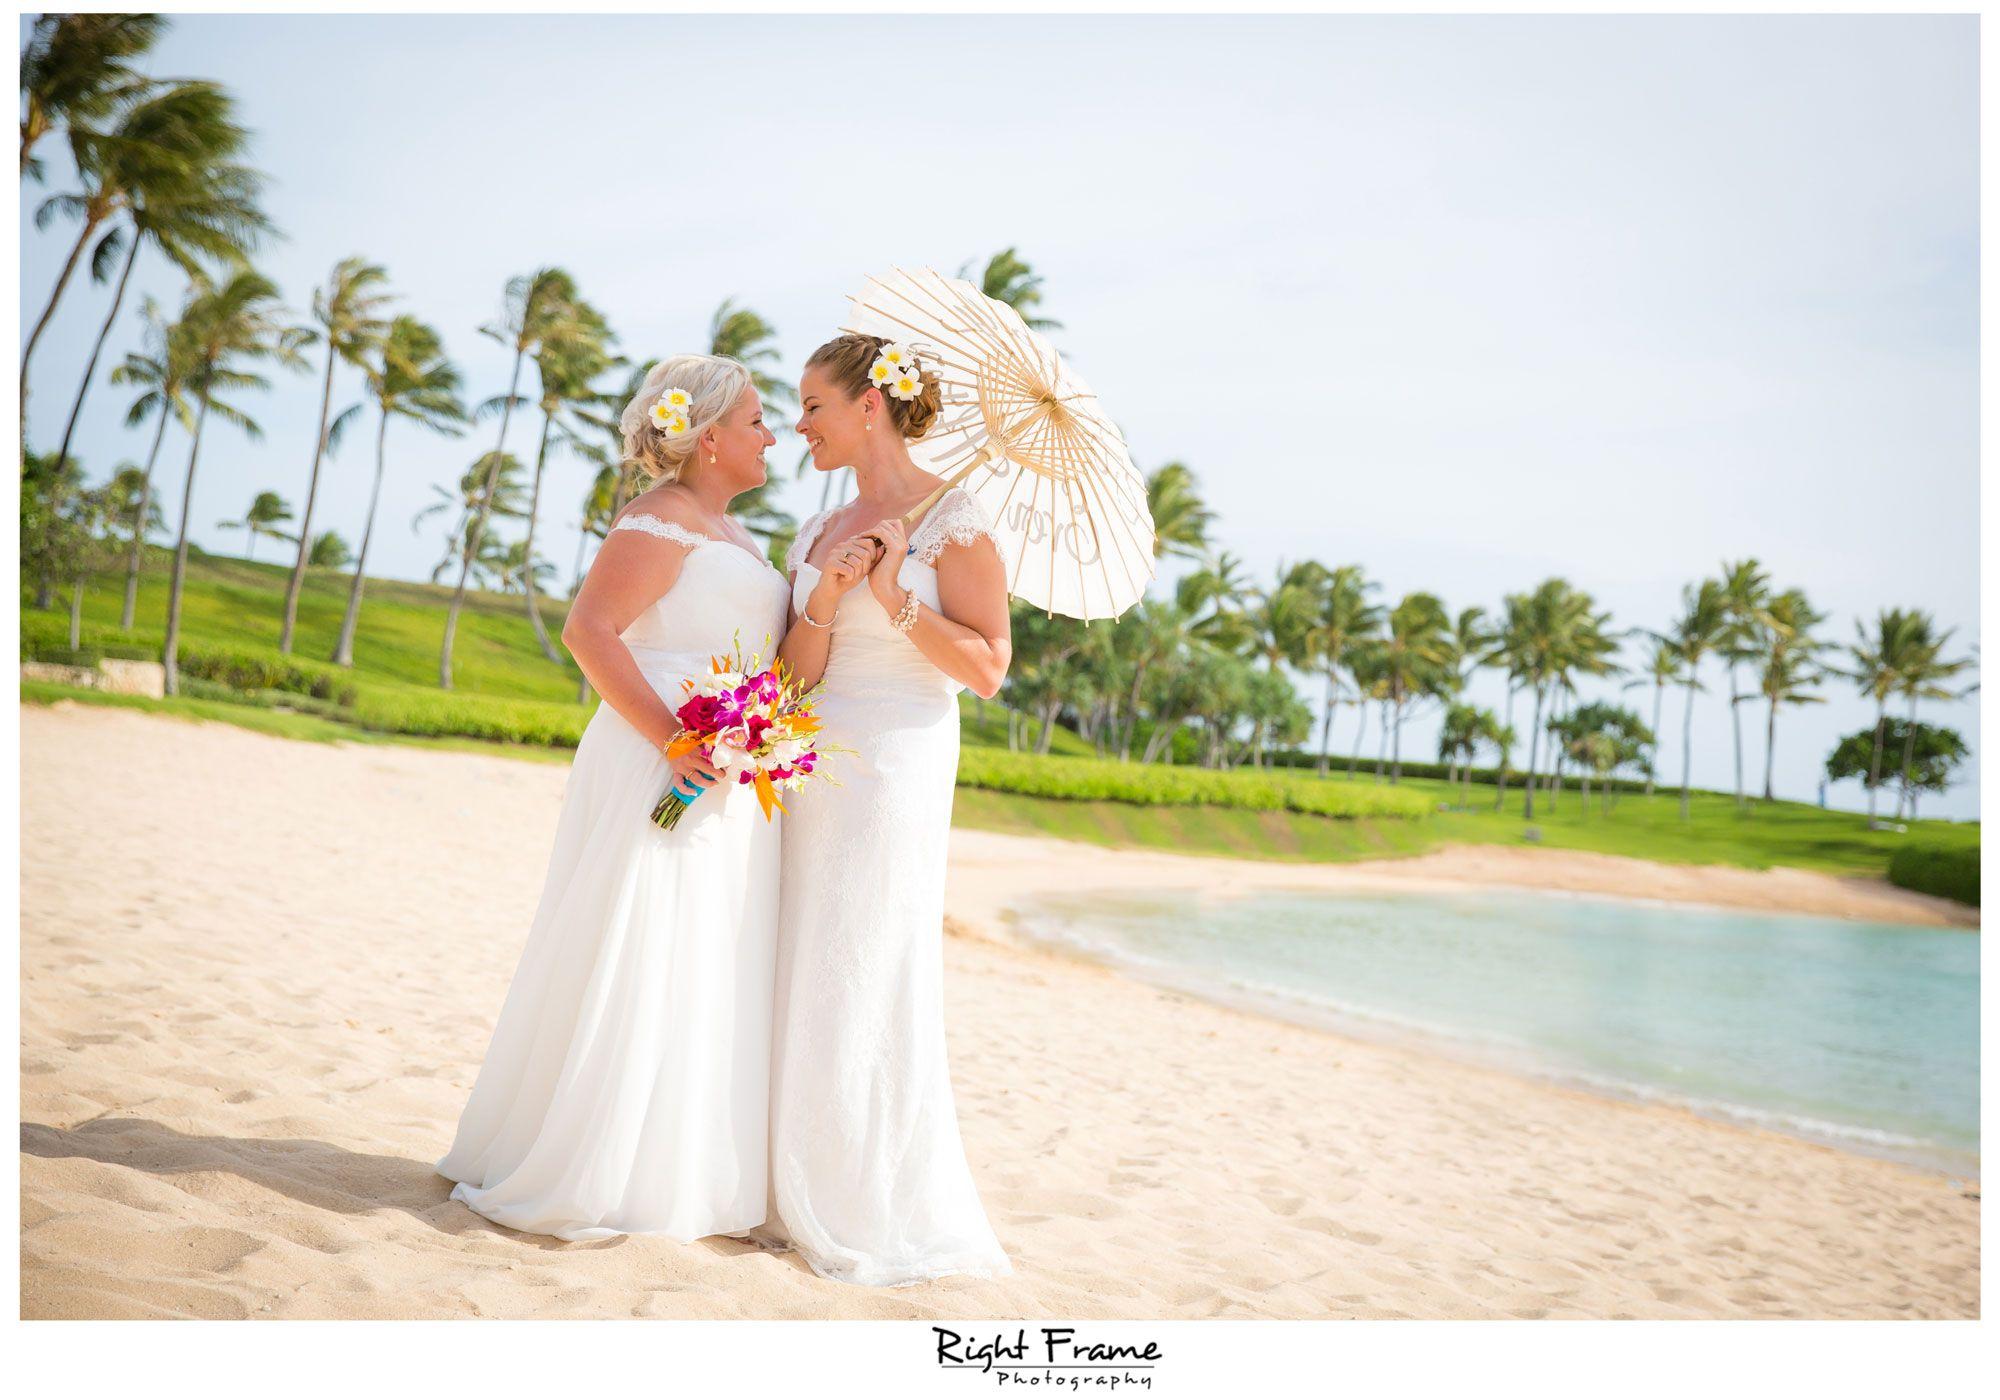 Rightframe paradise cove disney aulani resort hawaii